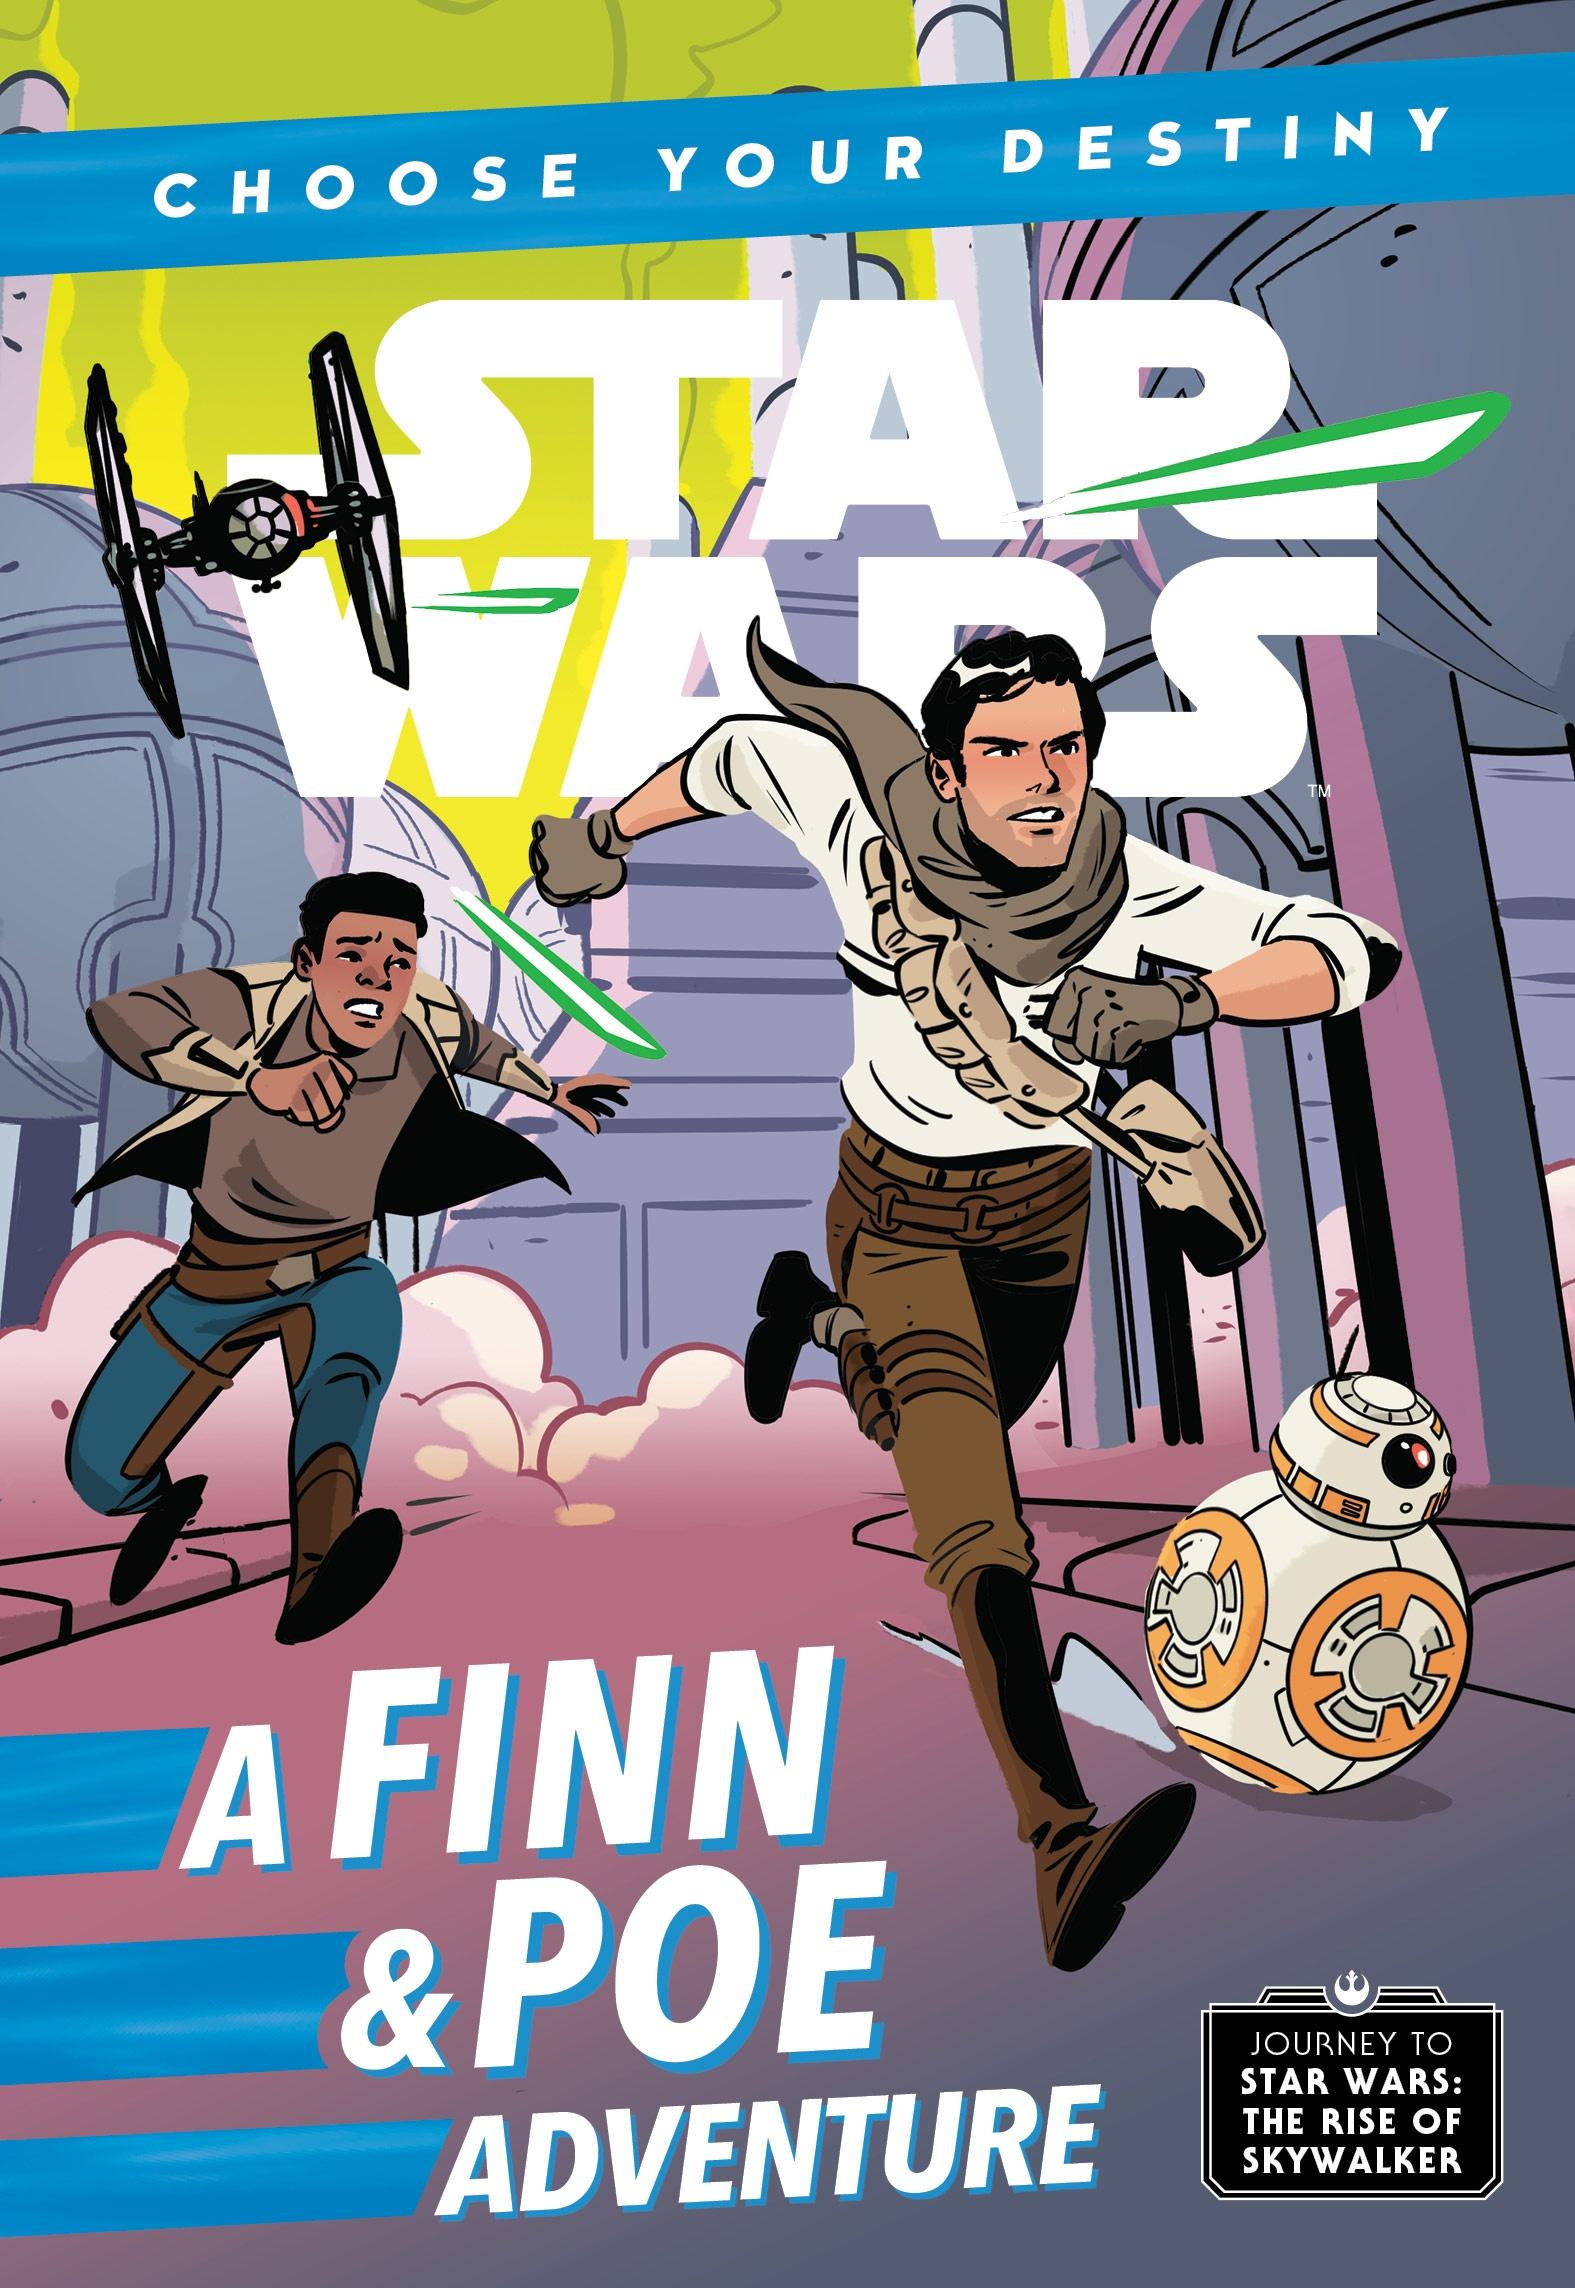 Choose Your Destiny: A Finn & Poe Adventure